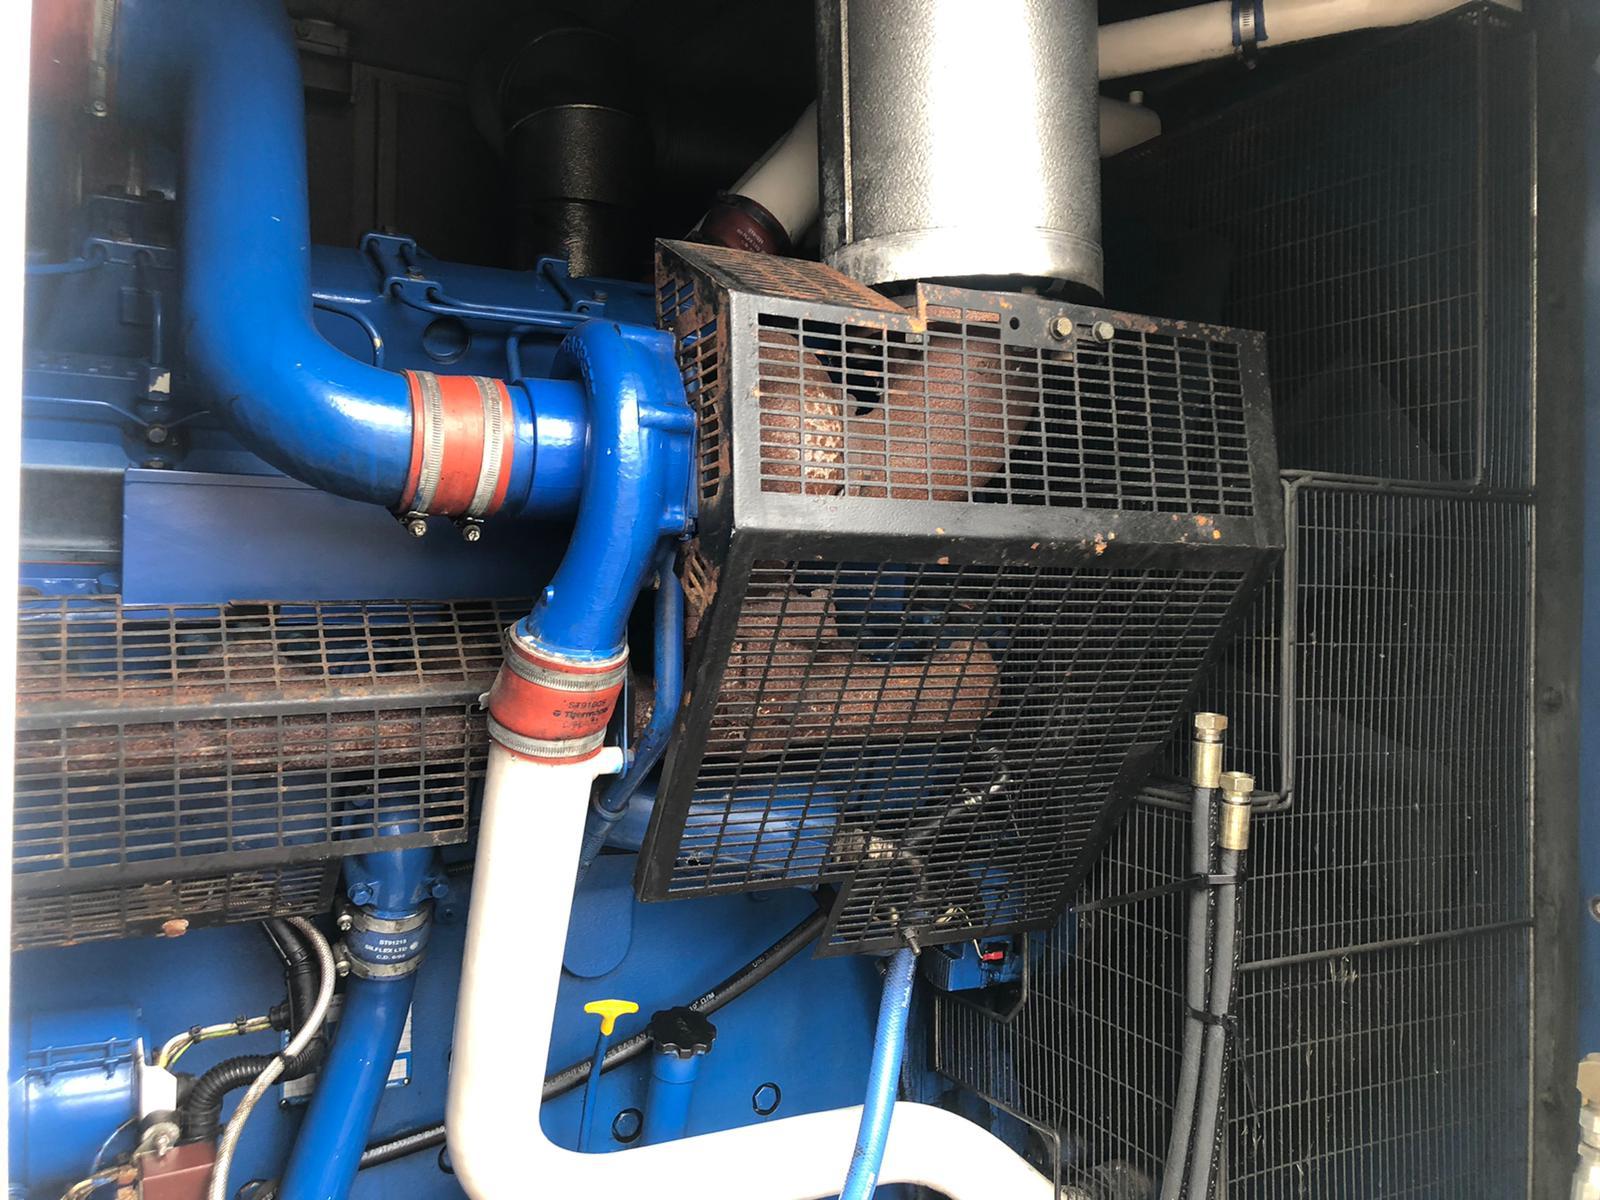 800 FG Wilson, Perkins/Stamford Generator 4